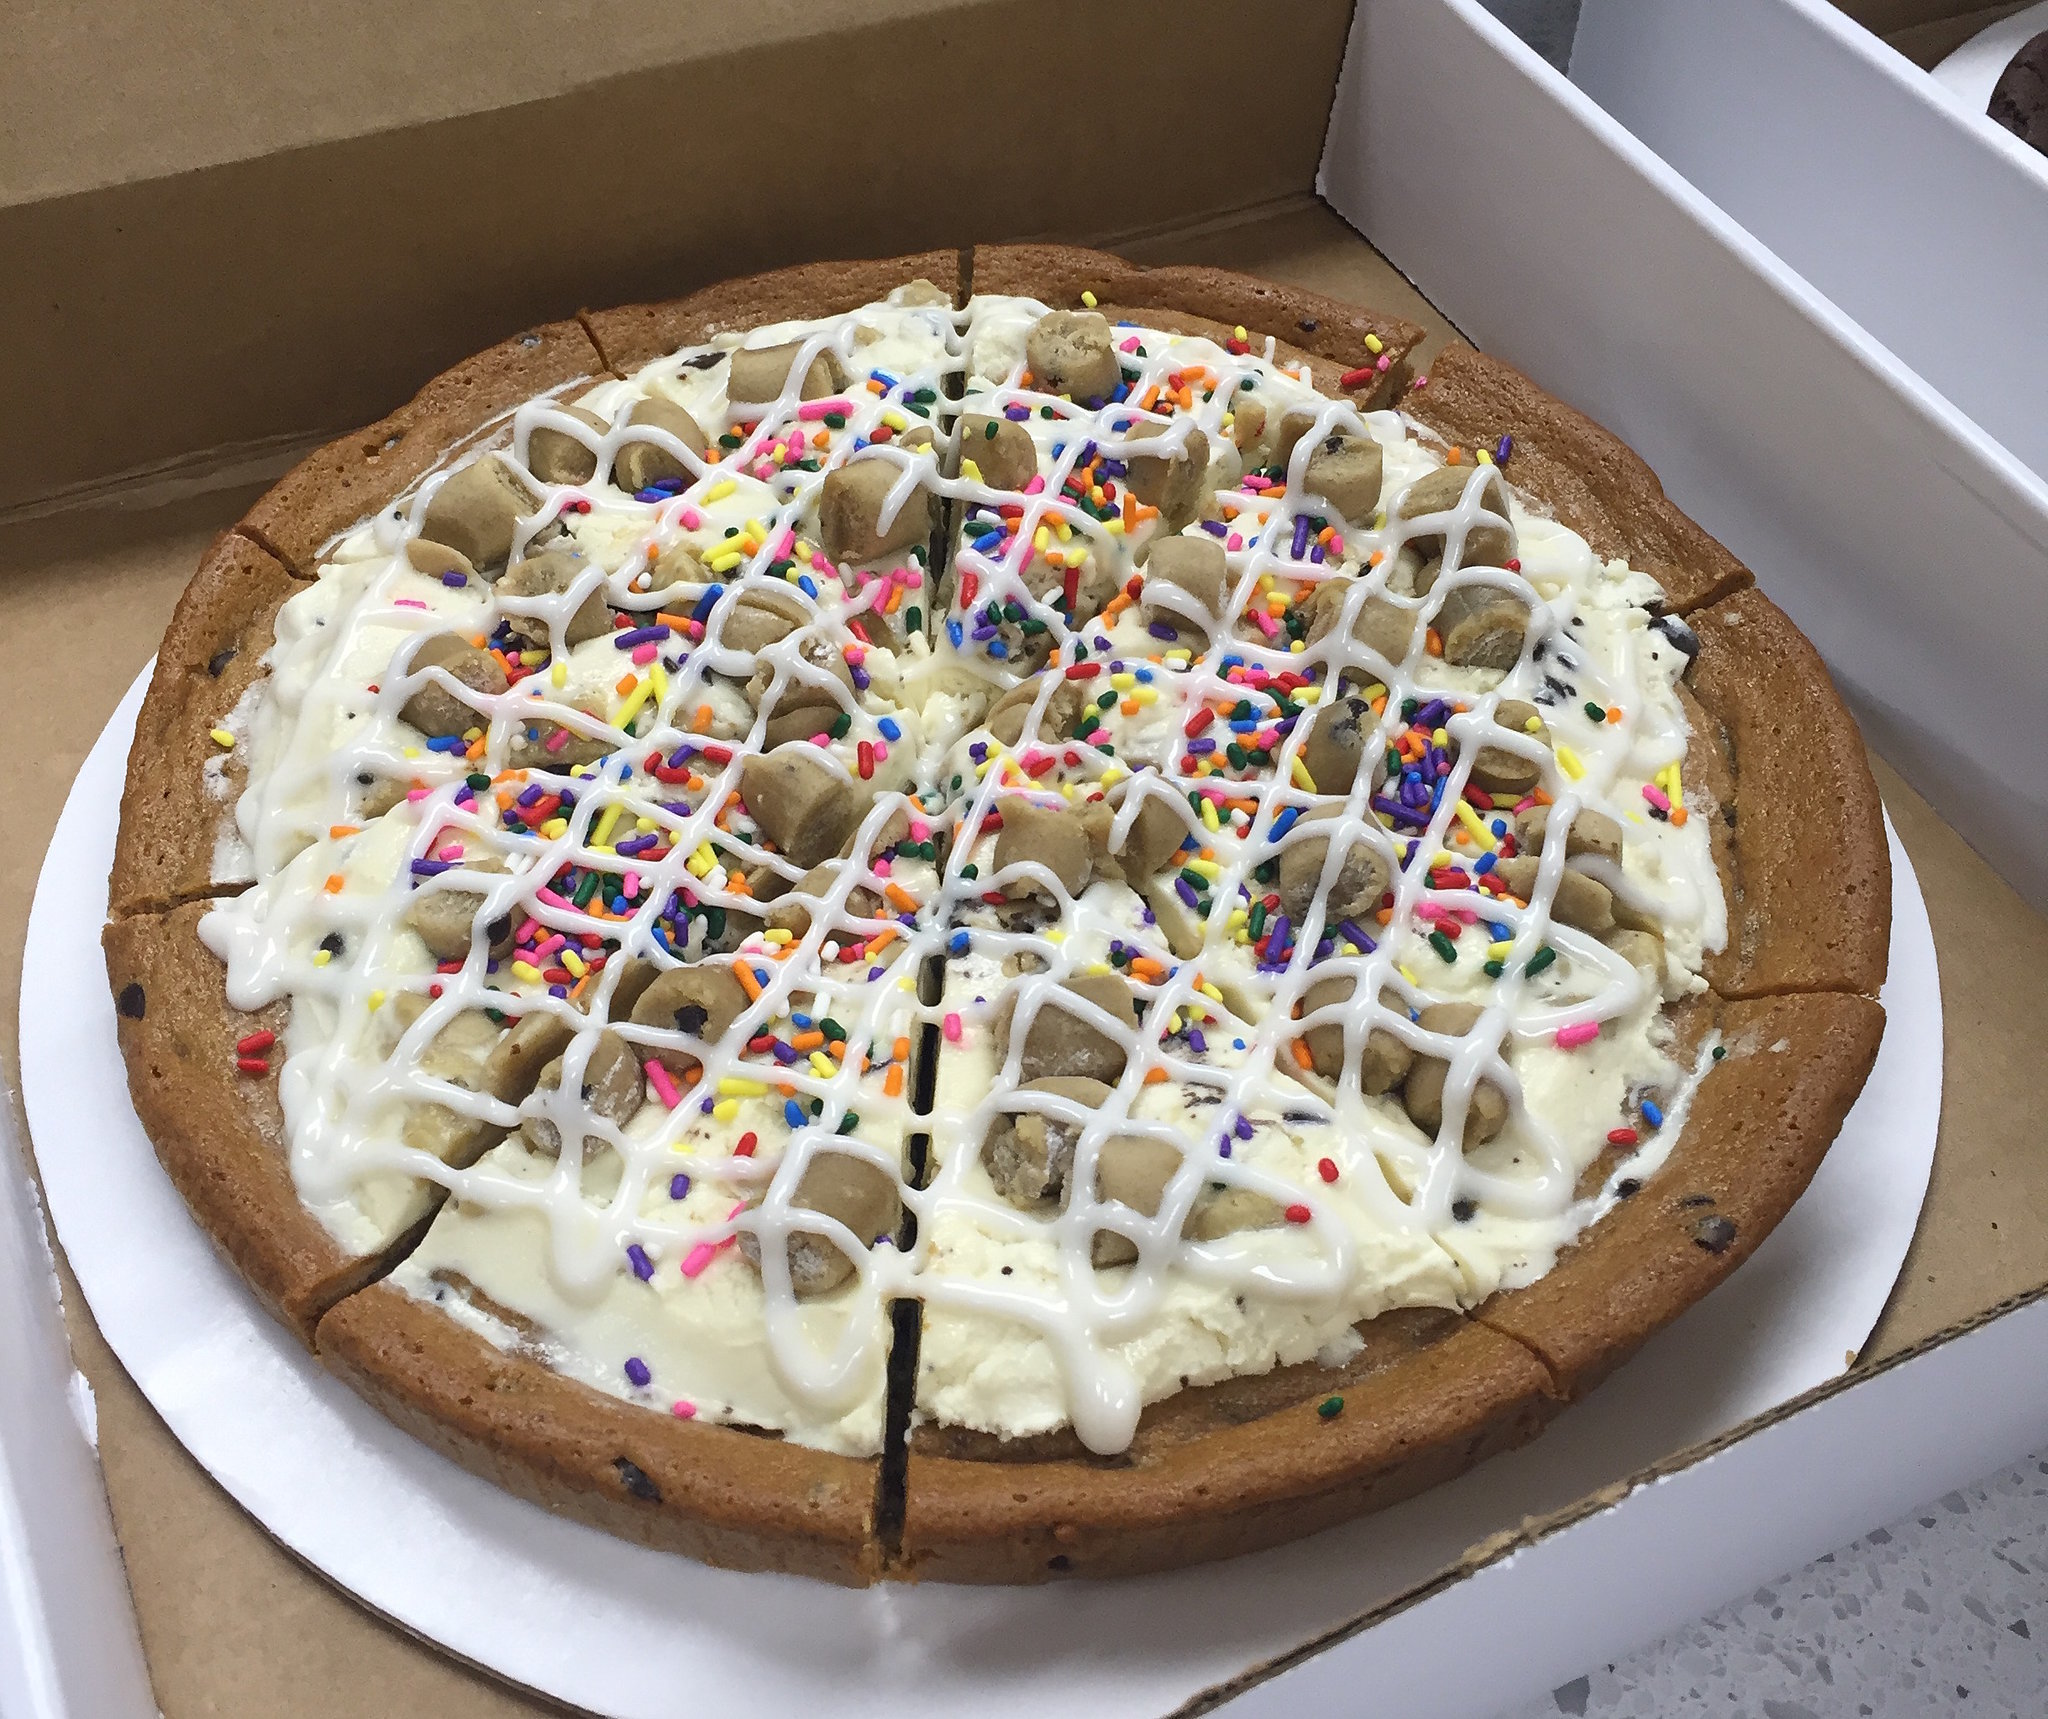 Cake Ice Cream Pizza : Baskin-Robbins New Products 2016 POPSUGAR Food